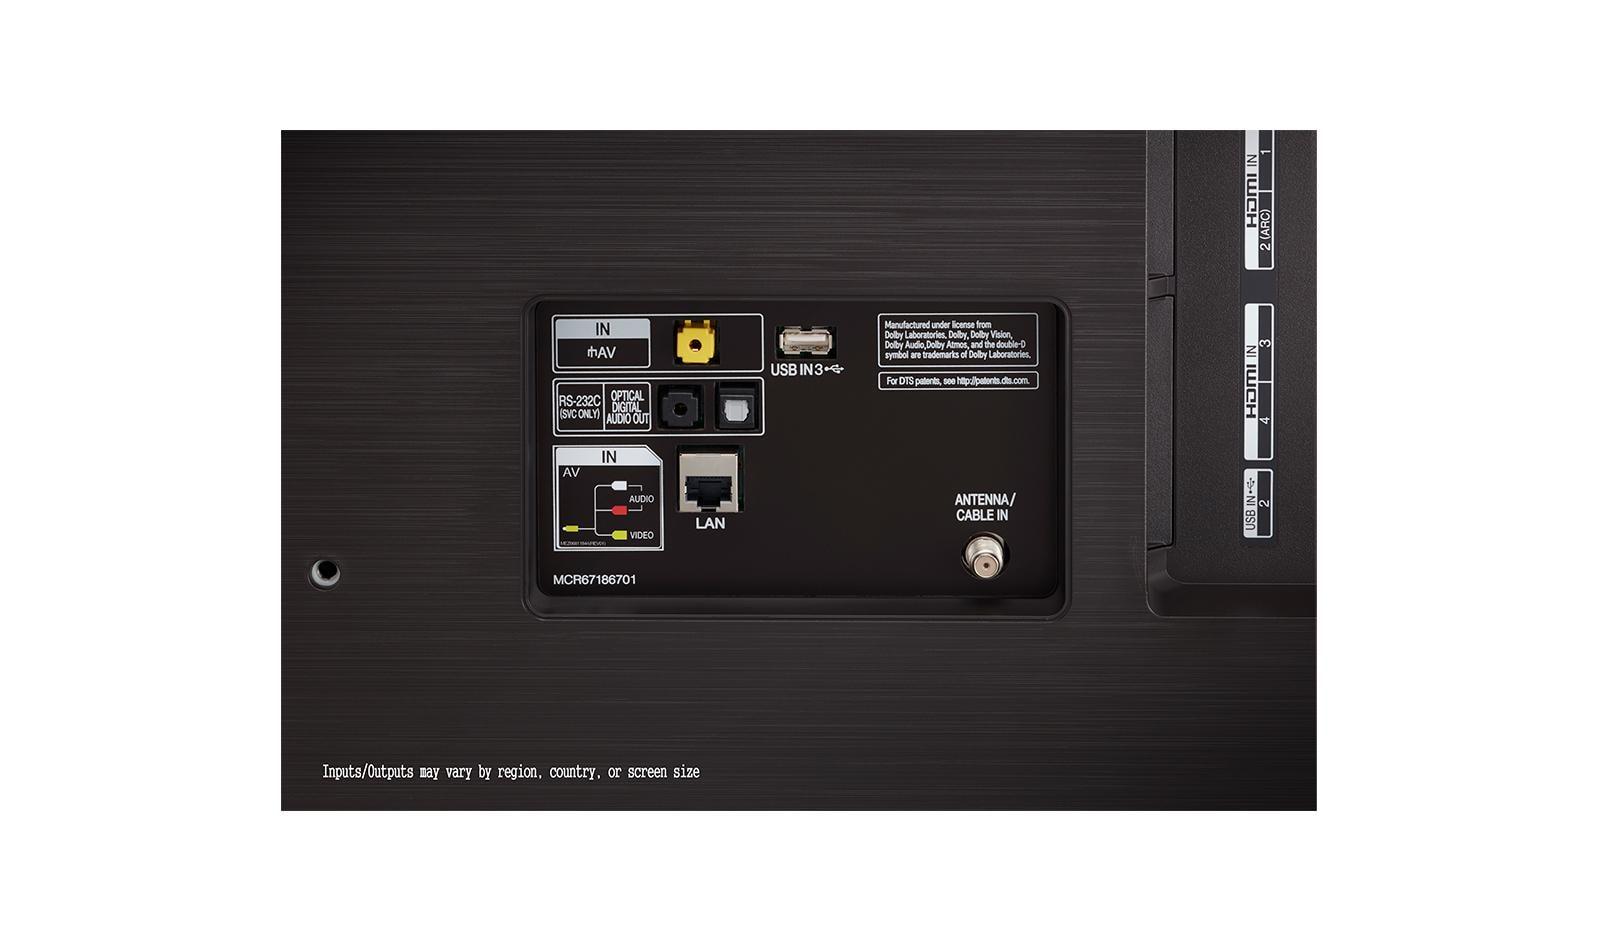 LG SK9500PUA